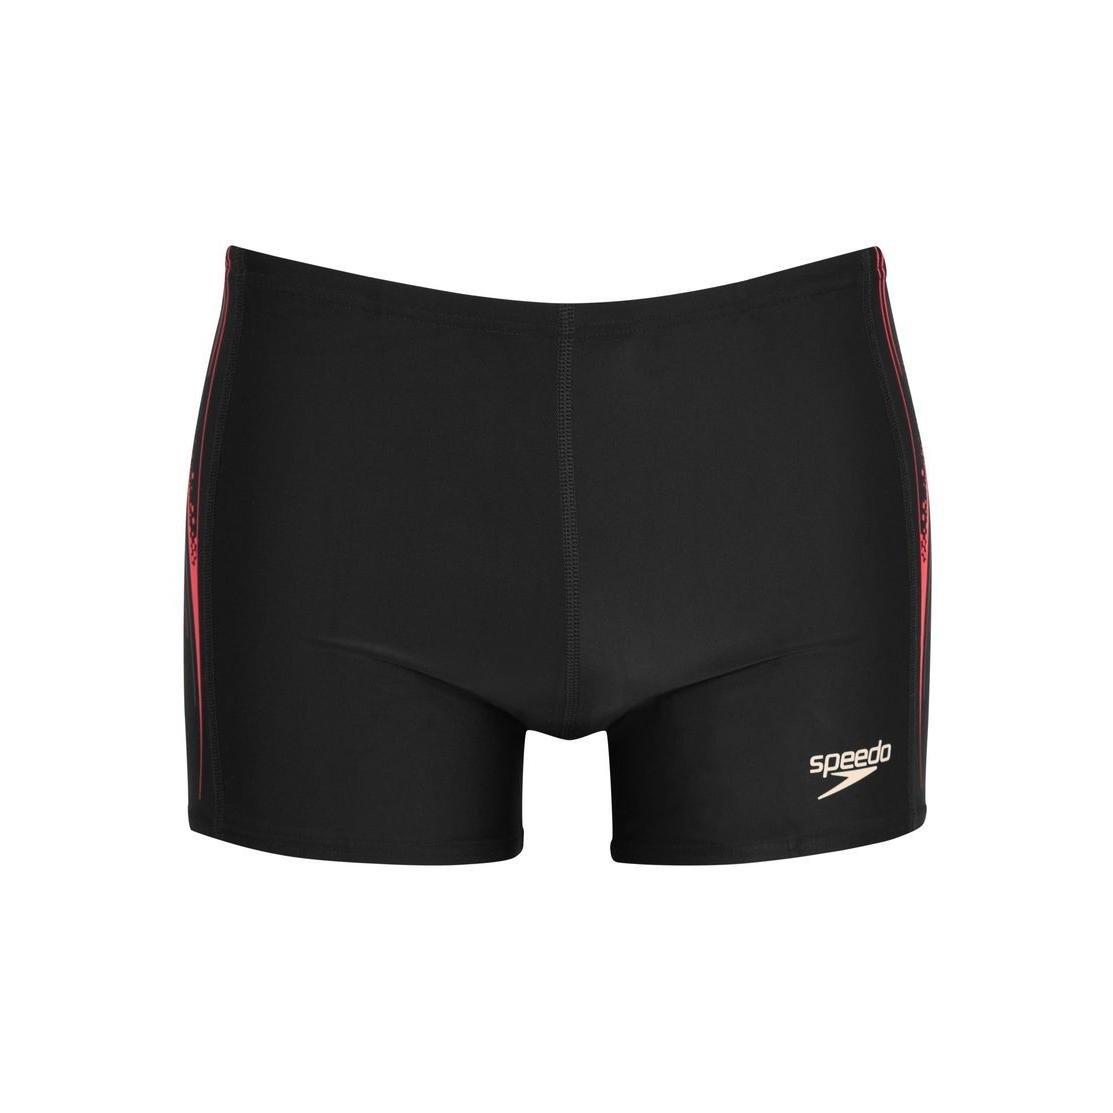 Speedo Men's Placement Aquashort Swimwear